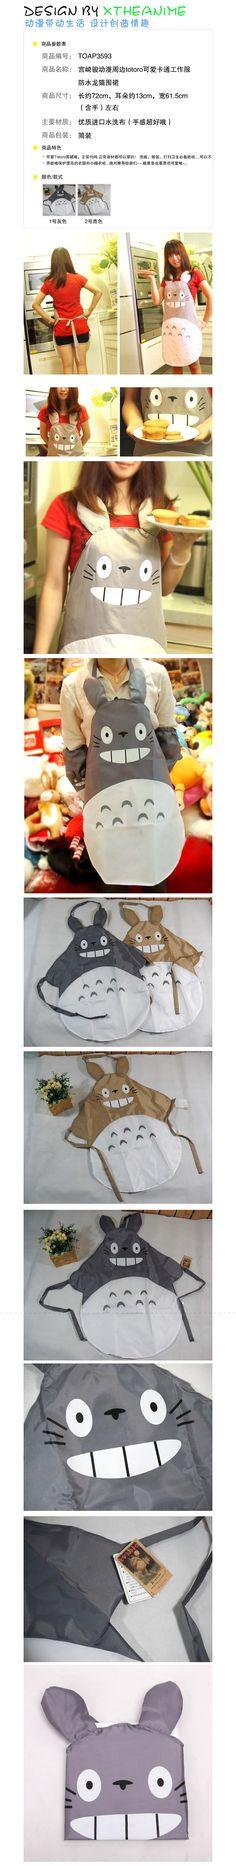 Studio Ghibli My Neighbor Totoro Waterproof Apron [TOAP3593] - $11.00 : Sales Anime wholesale, Anime Factory, Anime distributor, anime Suppliers,Anime toys store.